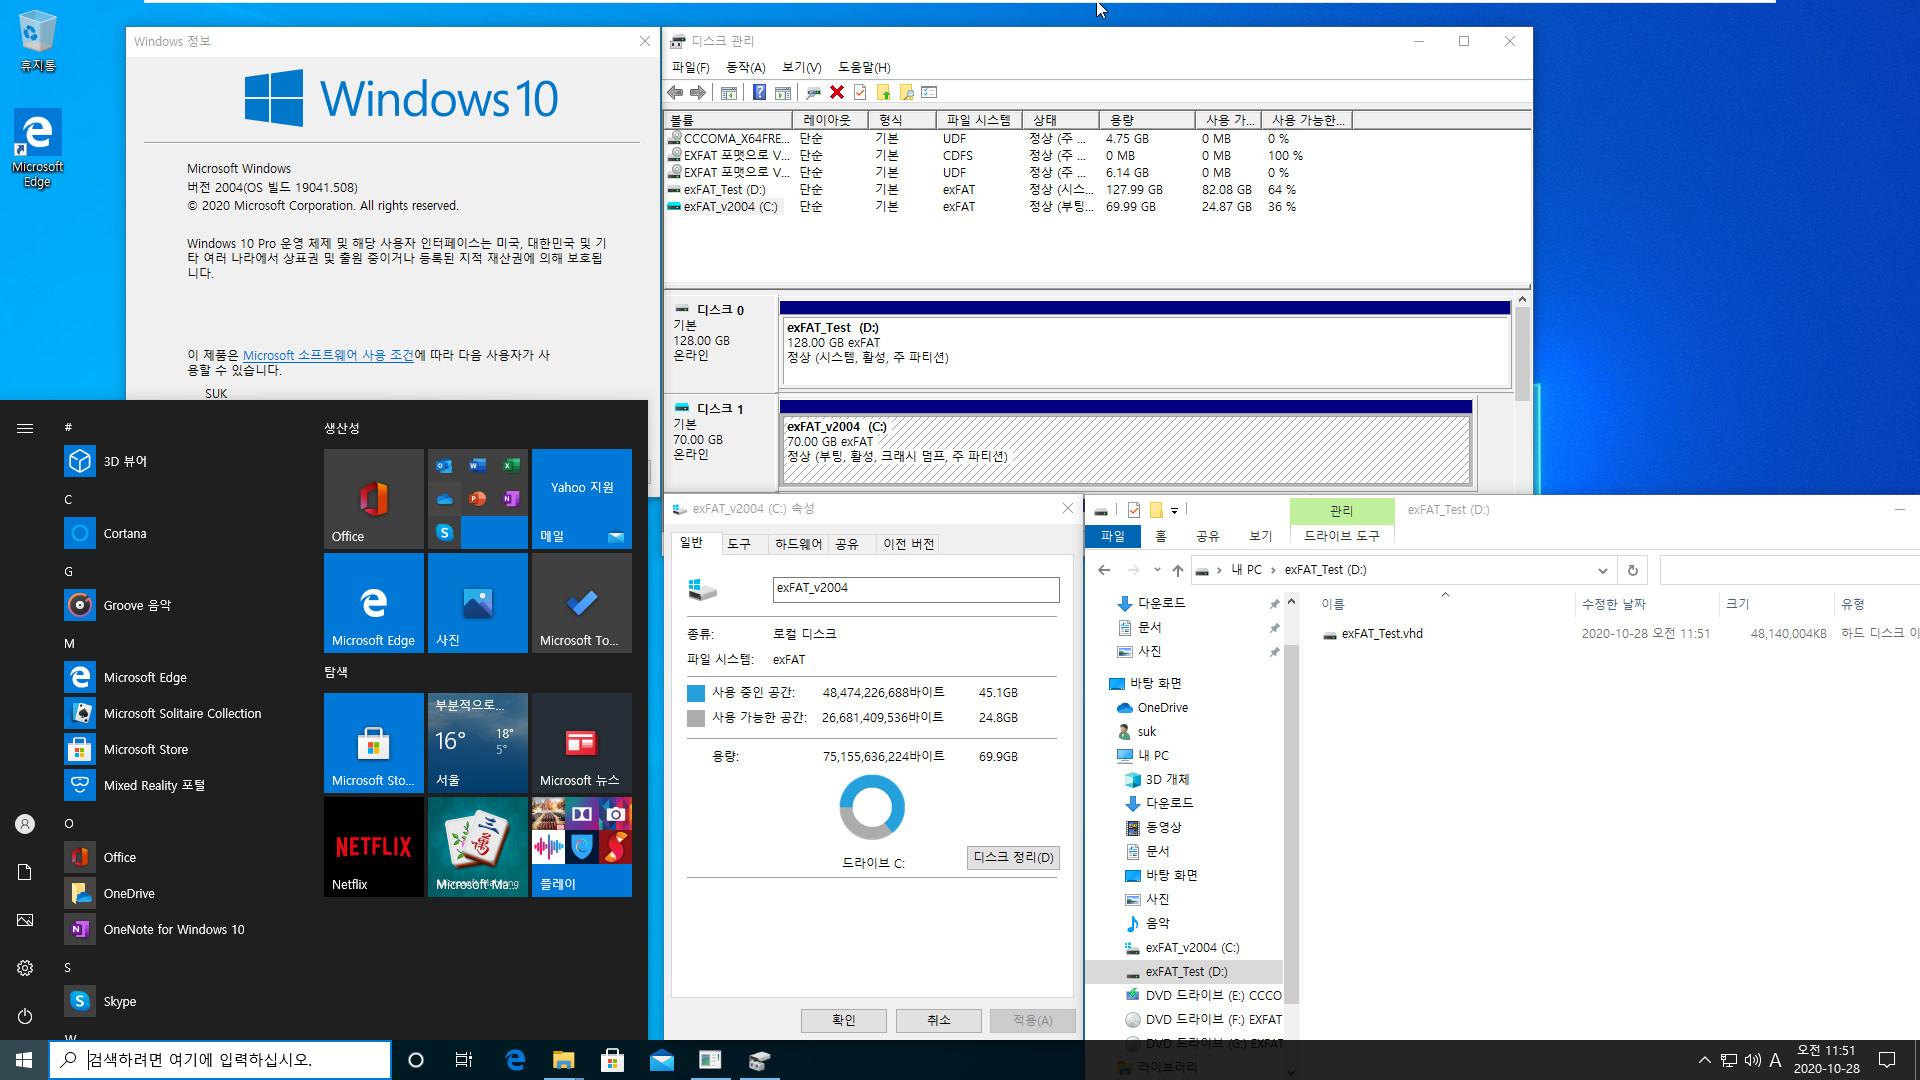 exFAT 포맷으로도 VHD 부팅이 Windows 10 버전 1903부터 된다고 하여 테스트 - 다시 윈도우 설치 boot.wim에서 작업하니까 속도가 전보다는 빠르네요 2020-10-28_115117.jpg